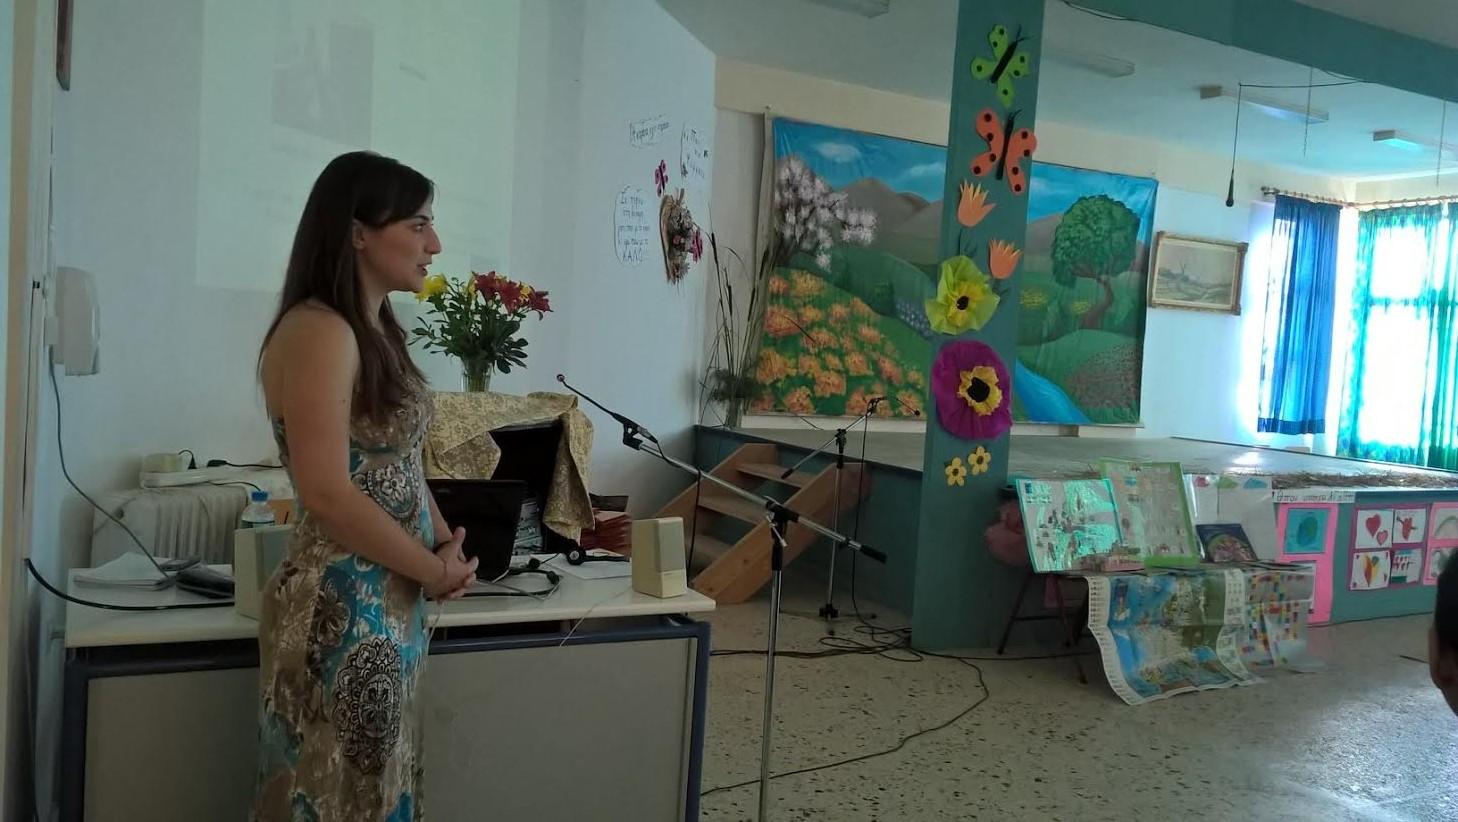 Teachers for Europe: «Μια Ευρώπη για όλους…» σε σχολεία της Αιτωλοακαρνανίας